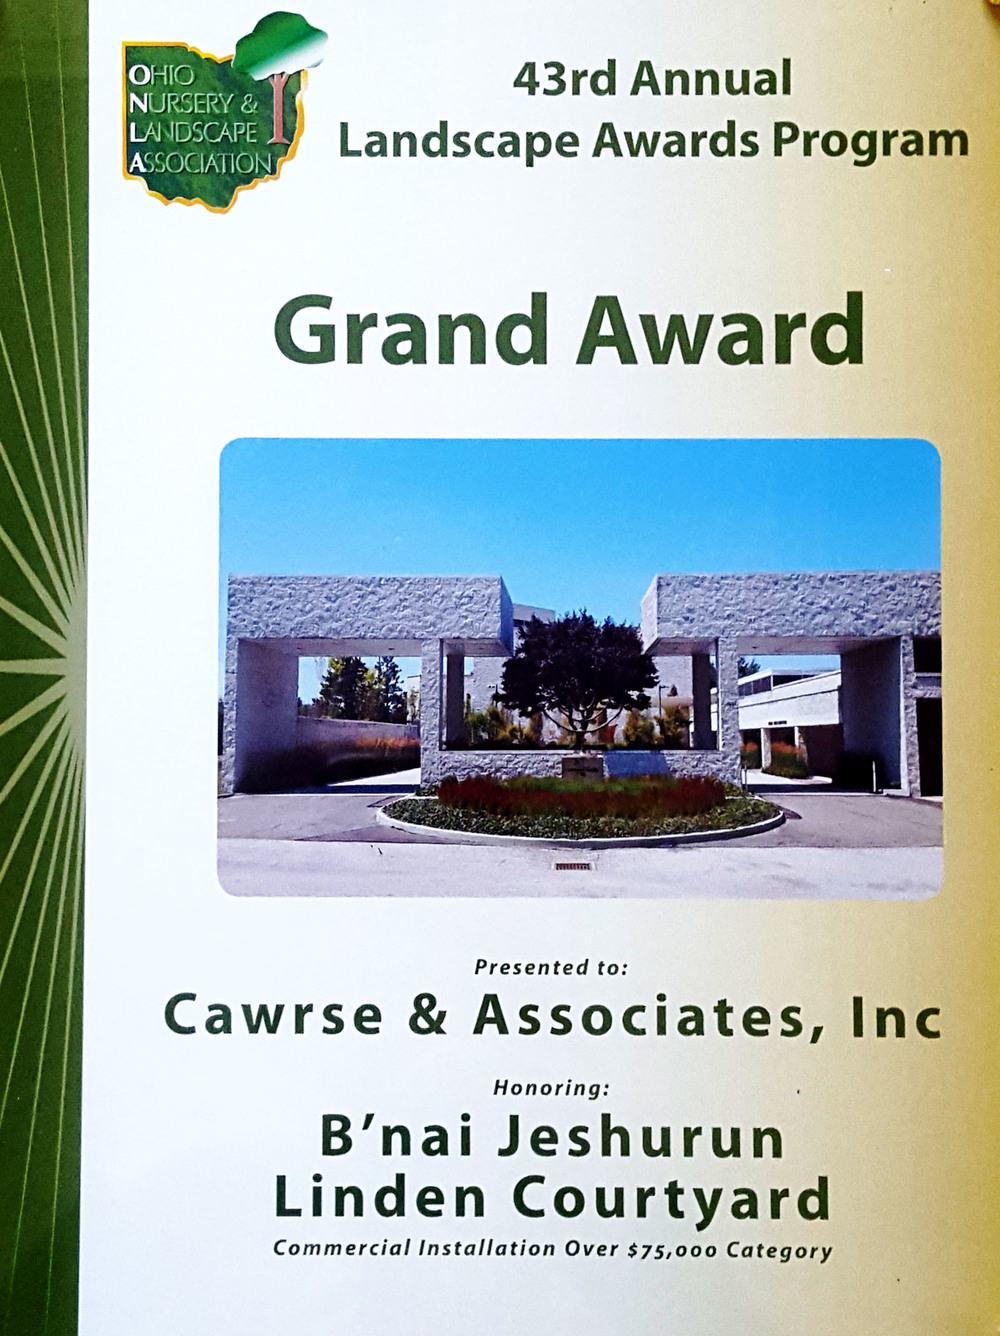 grand award picture.jpg